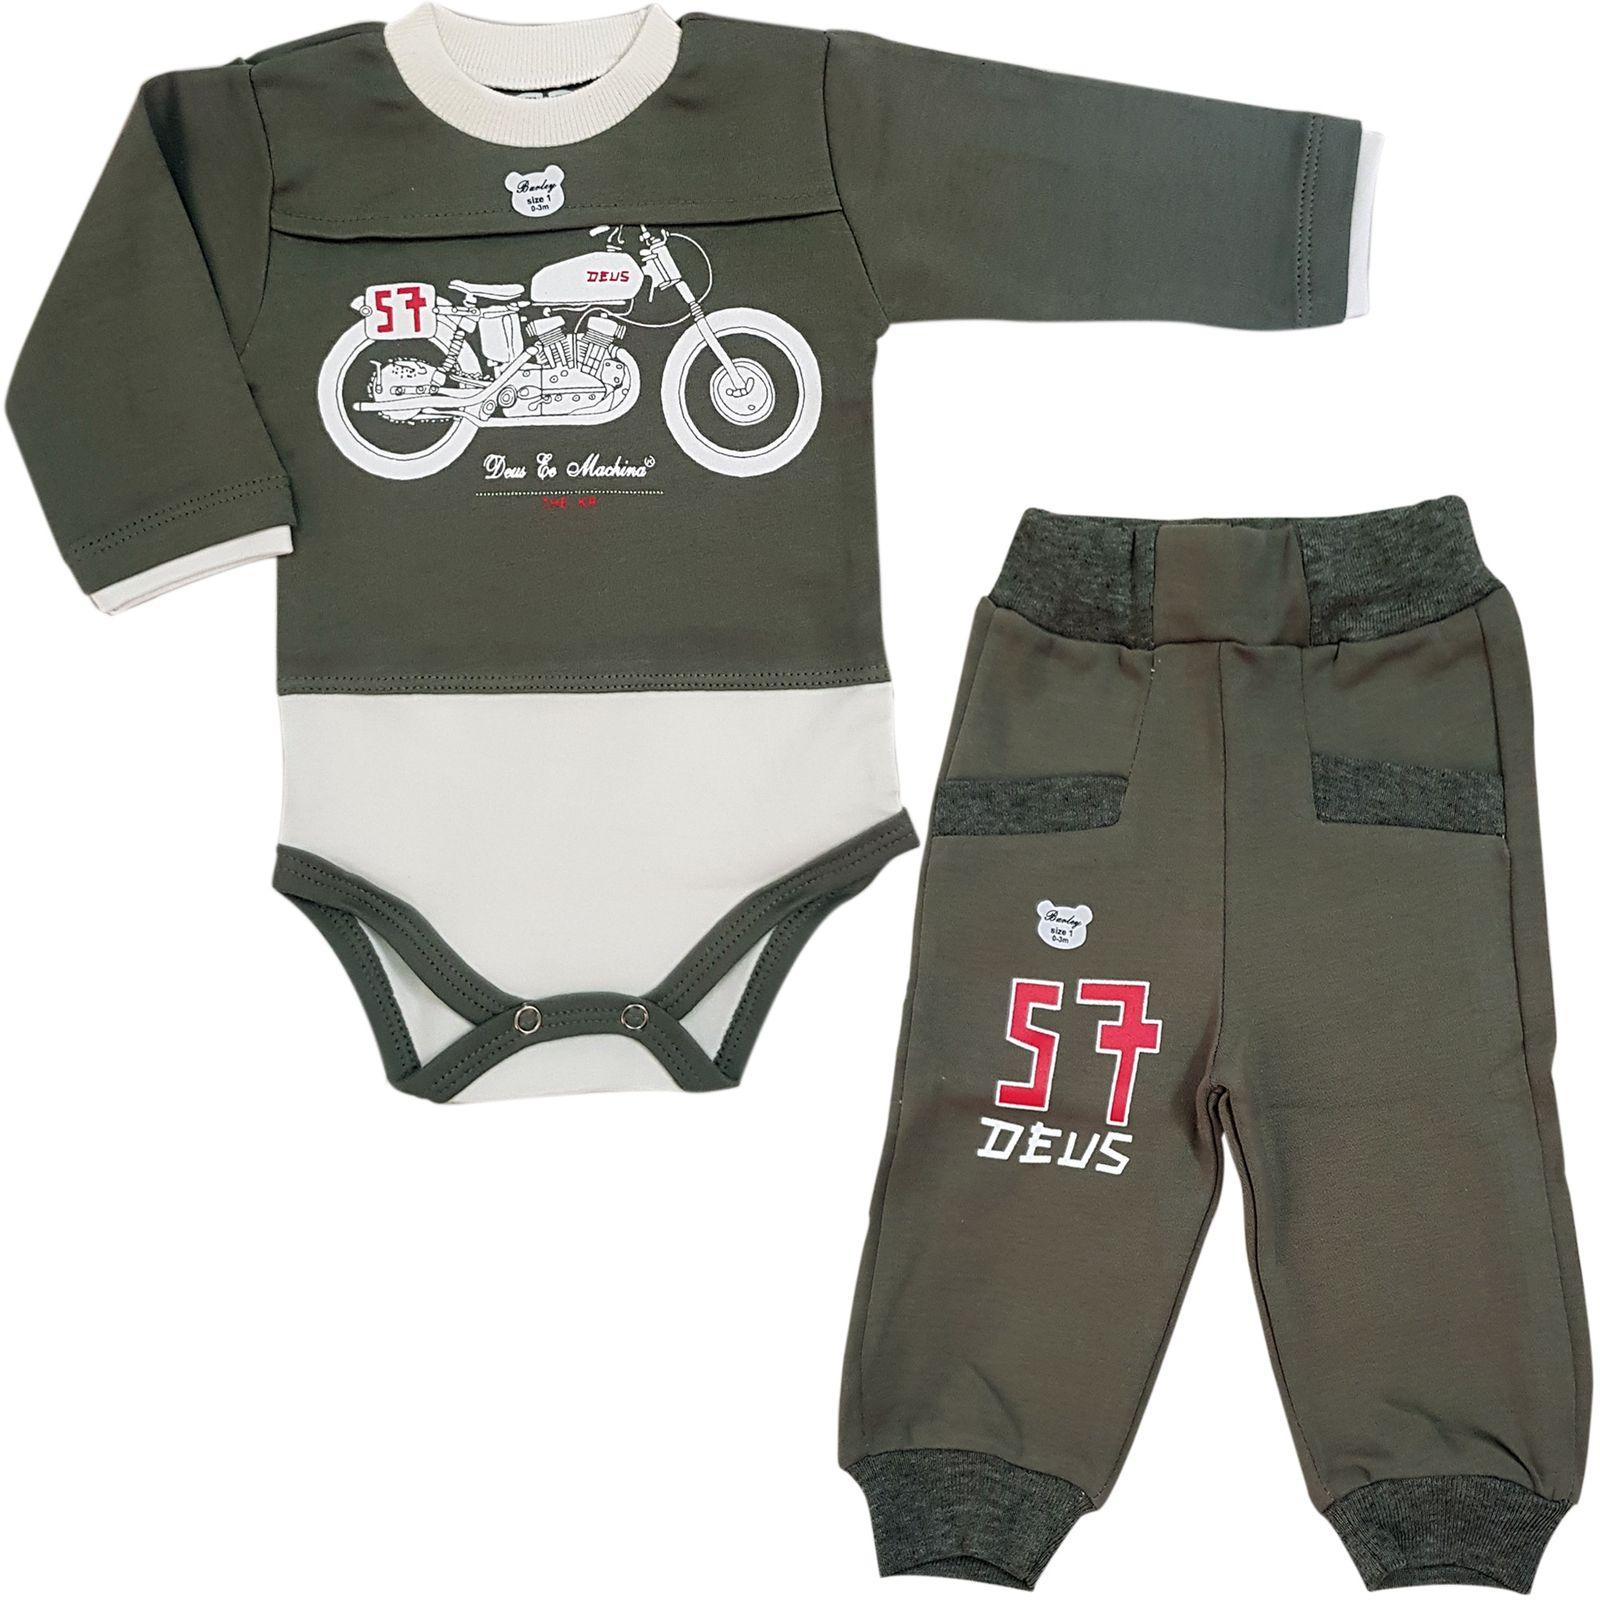 ست بادی و شلوار نوزادی پسرانه طرح موتور -  - 2